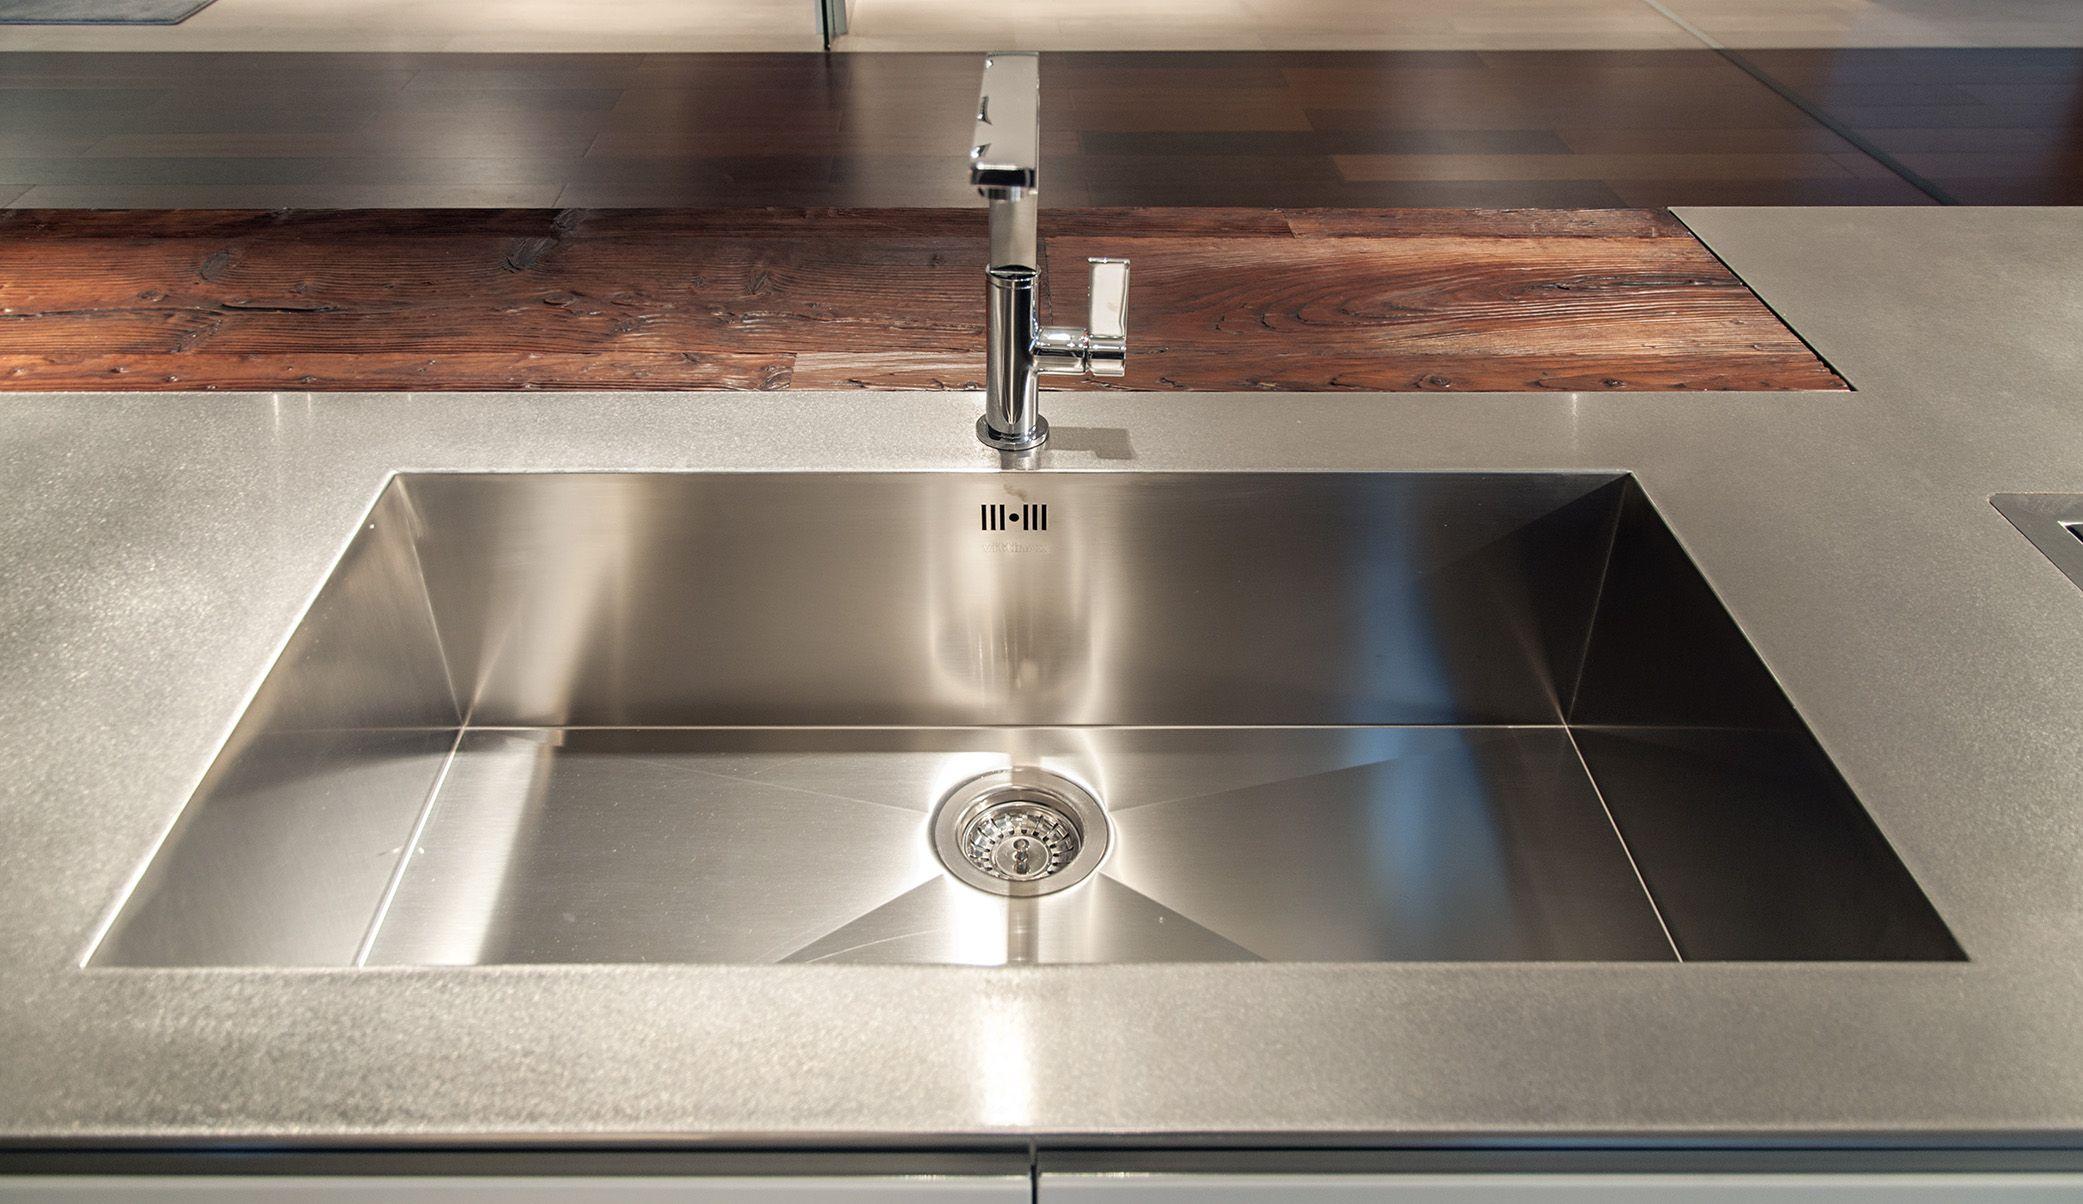 armony italian kitchen design wwwarmonycucineit welded sink - Italian Kitchen Design Sinks